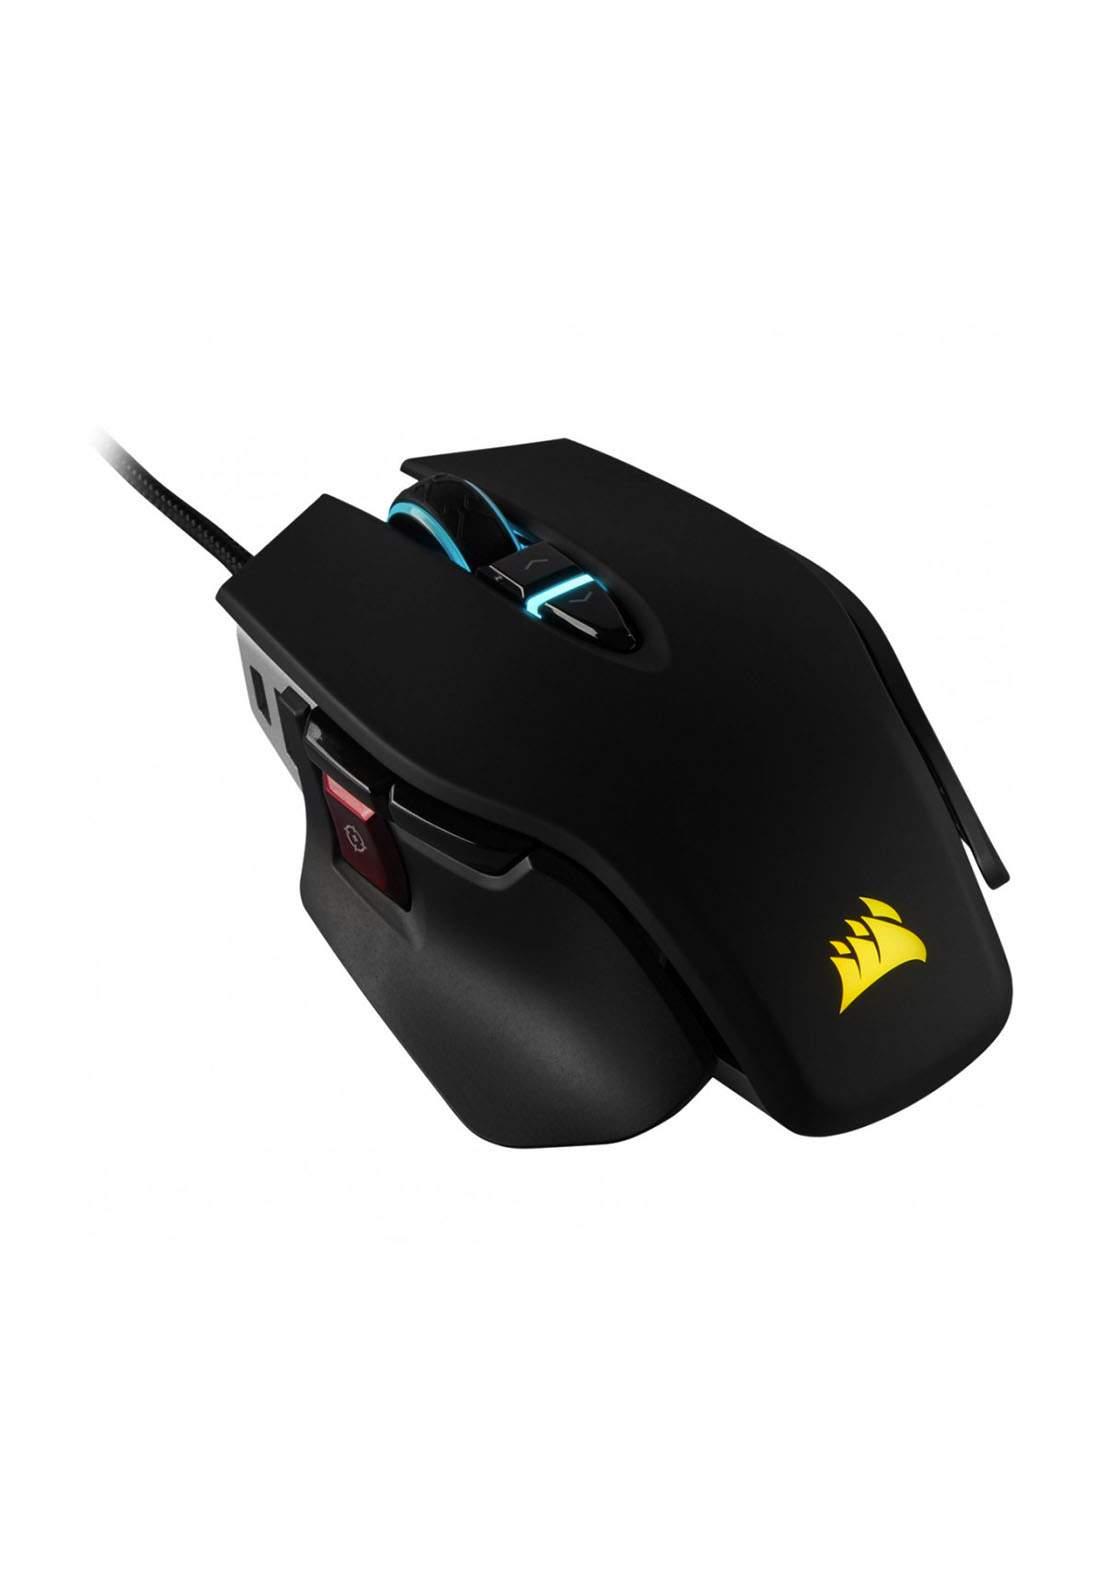 Corsair M65 Rgb Elite Gaming Mouse-Black ماوس